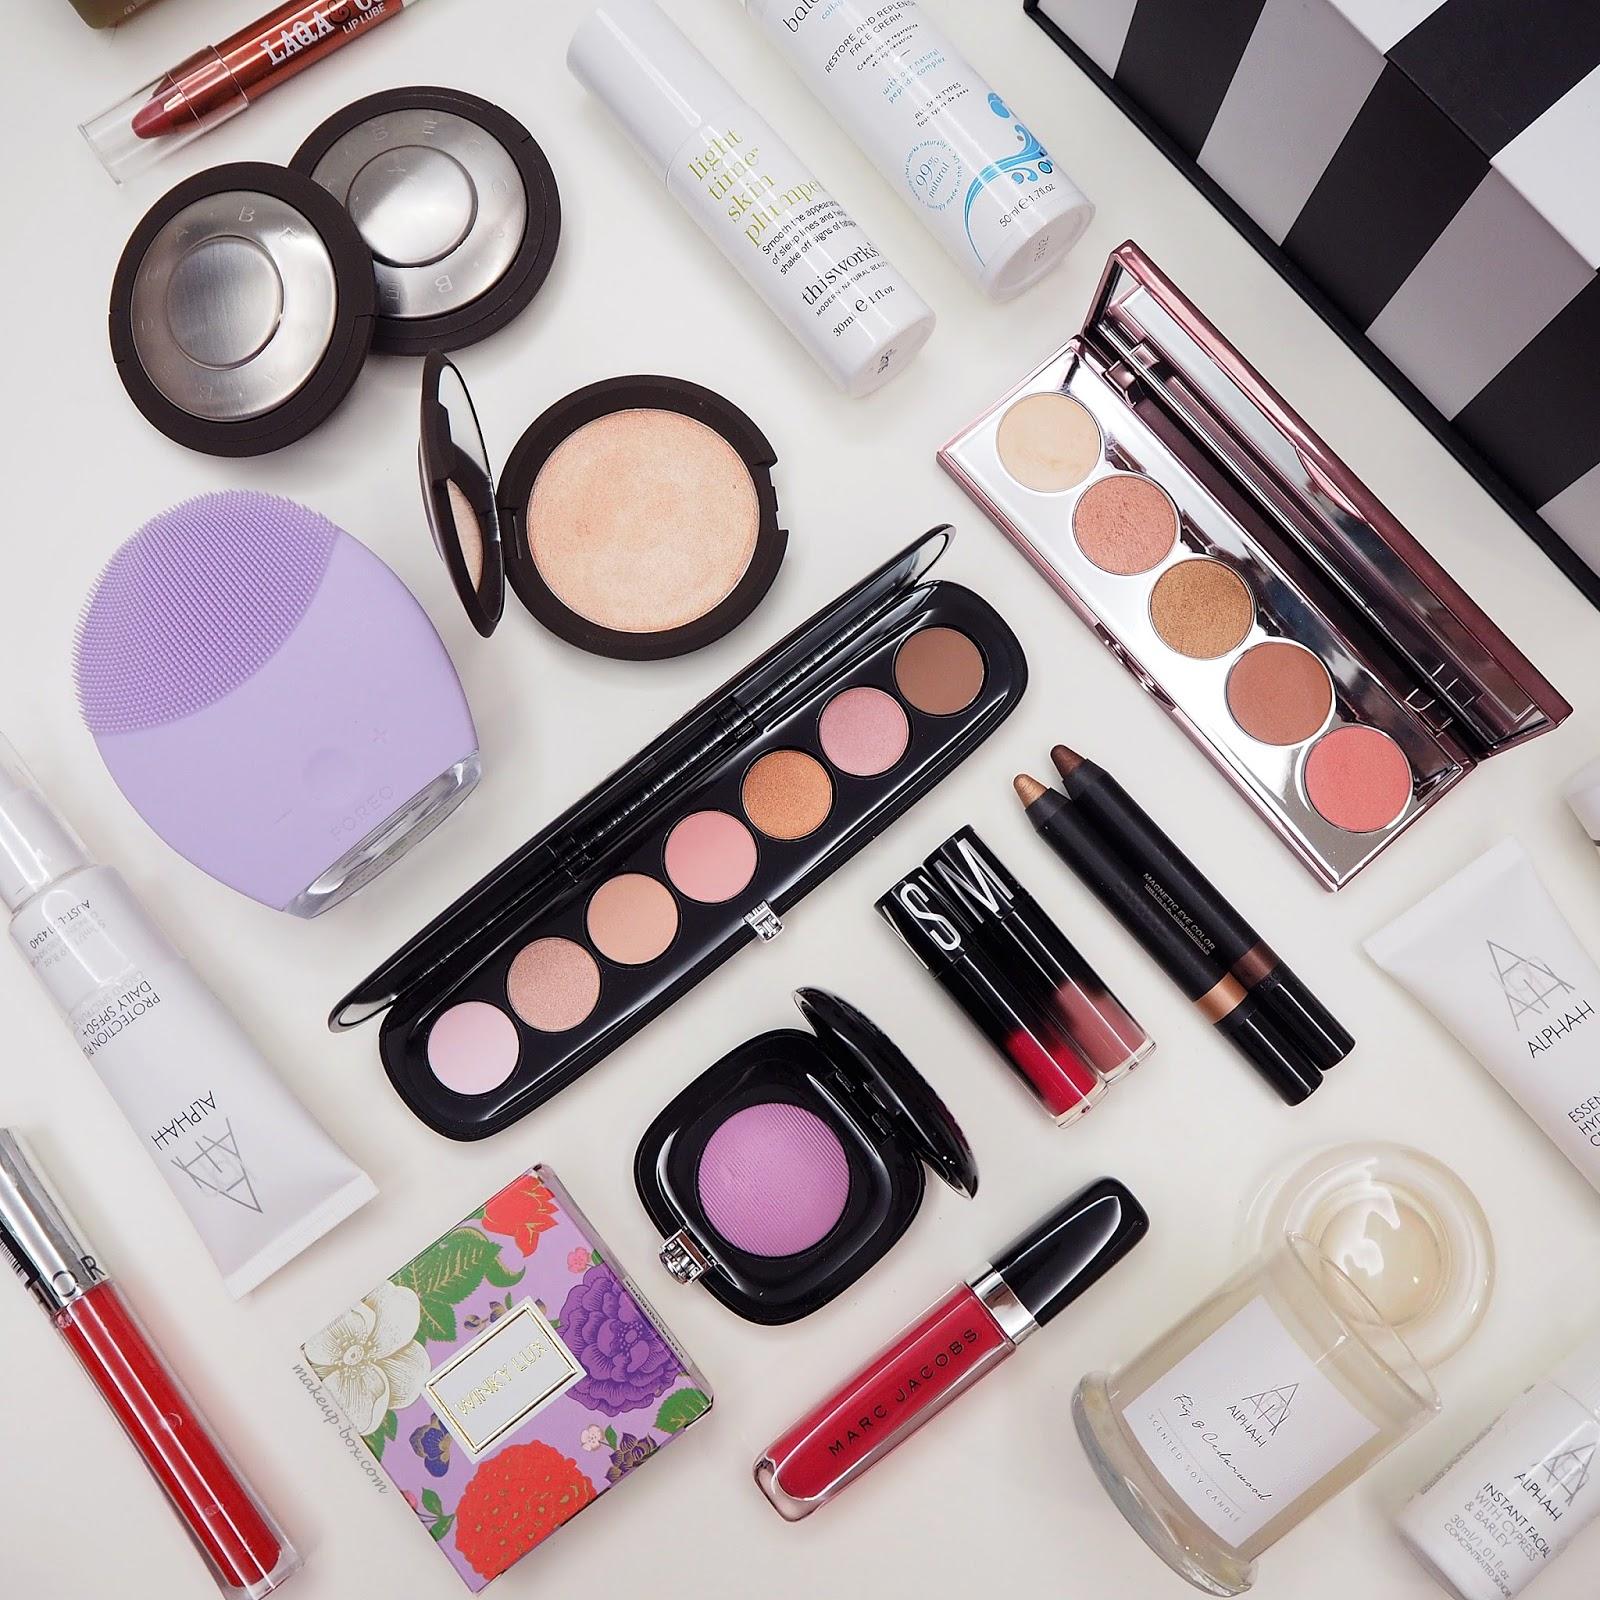 sephora makeup box singapore fay blog